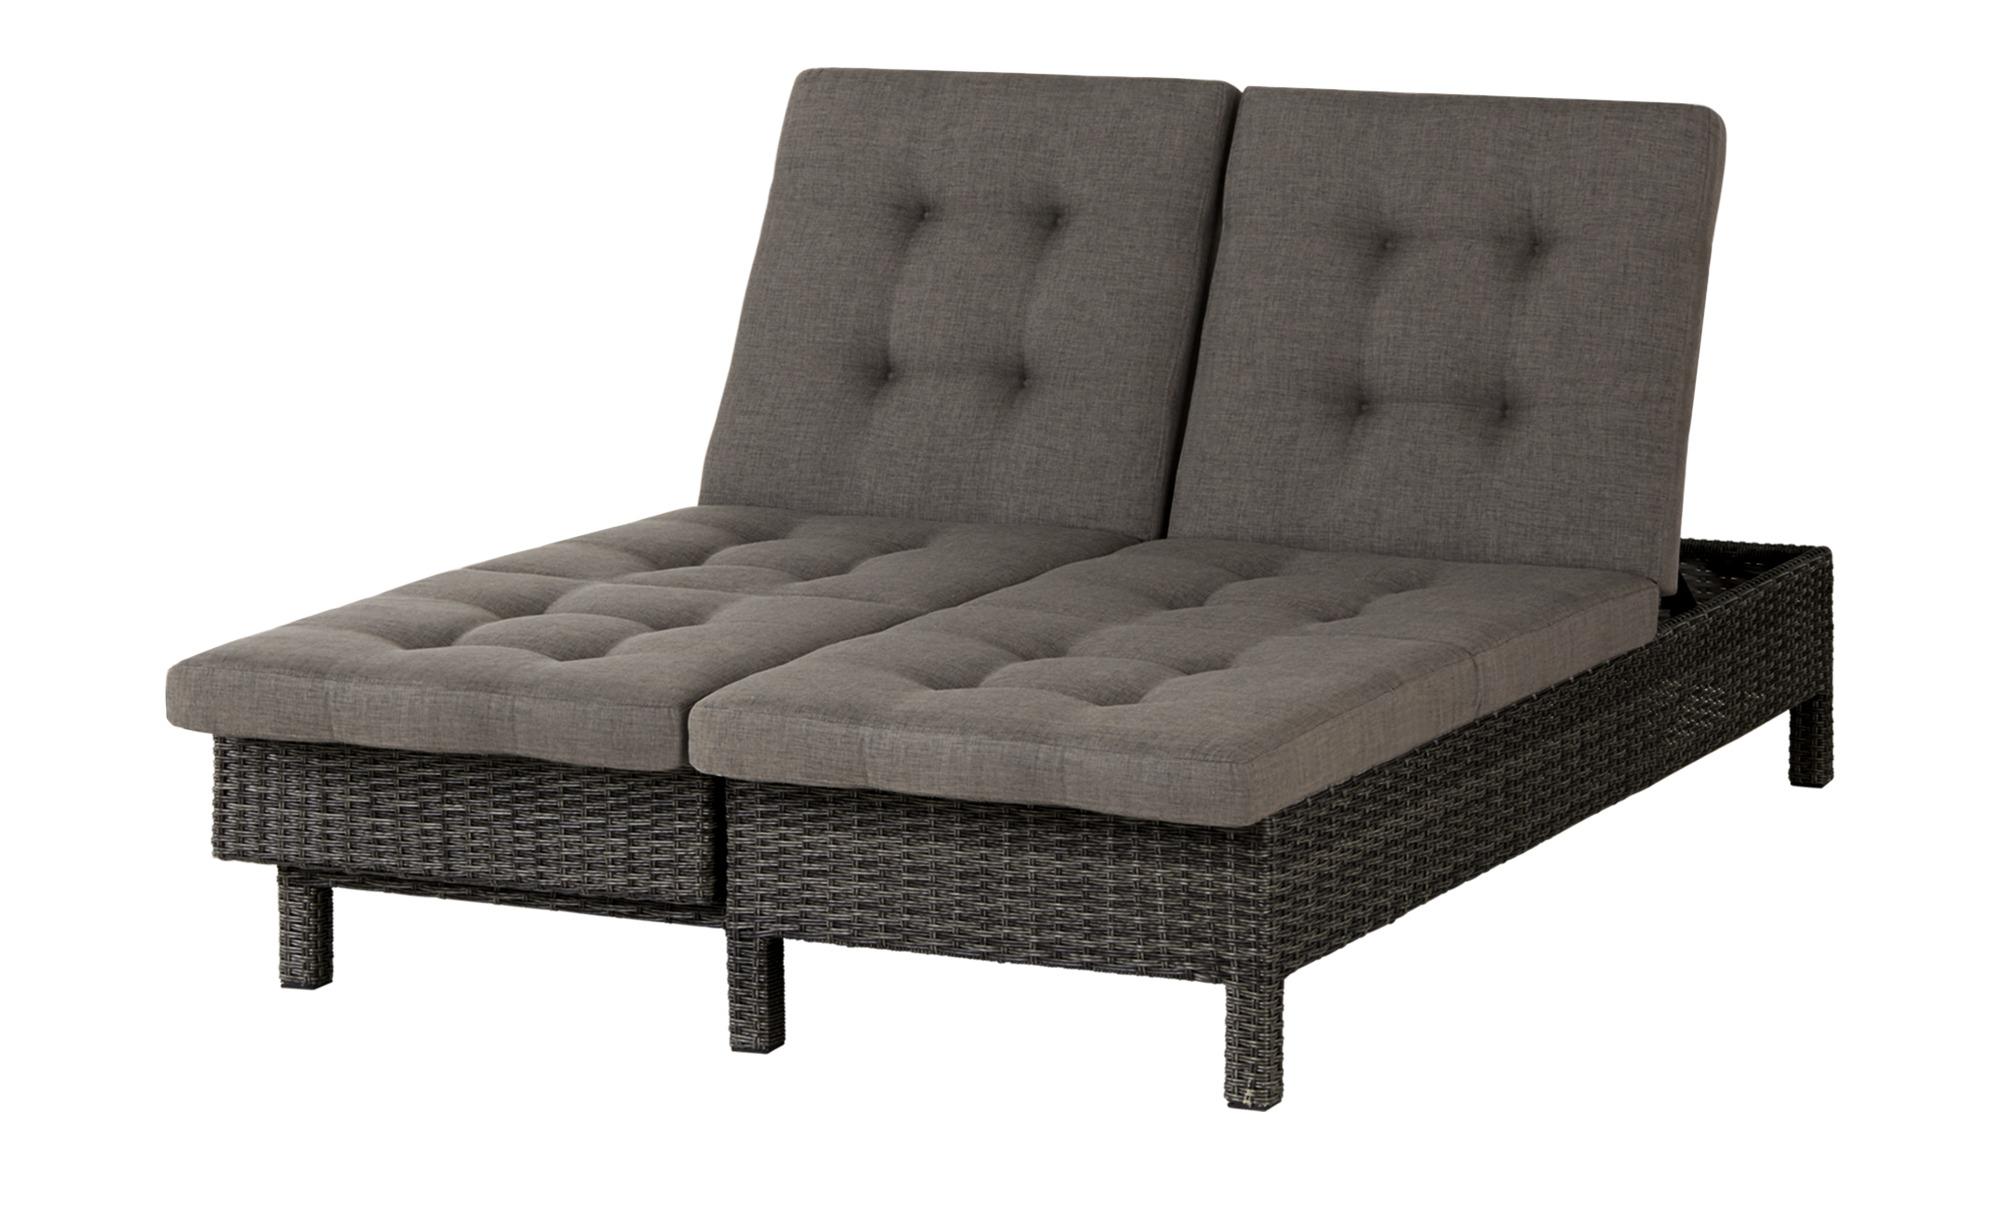 Top a casa mia Garten Lounge-Sofa, 3-Sitzer Padua - Möbel Kraft PY11